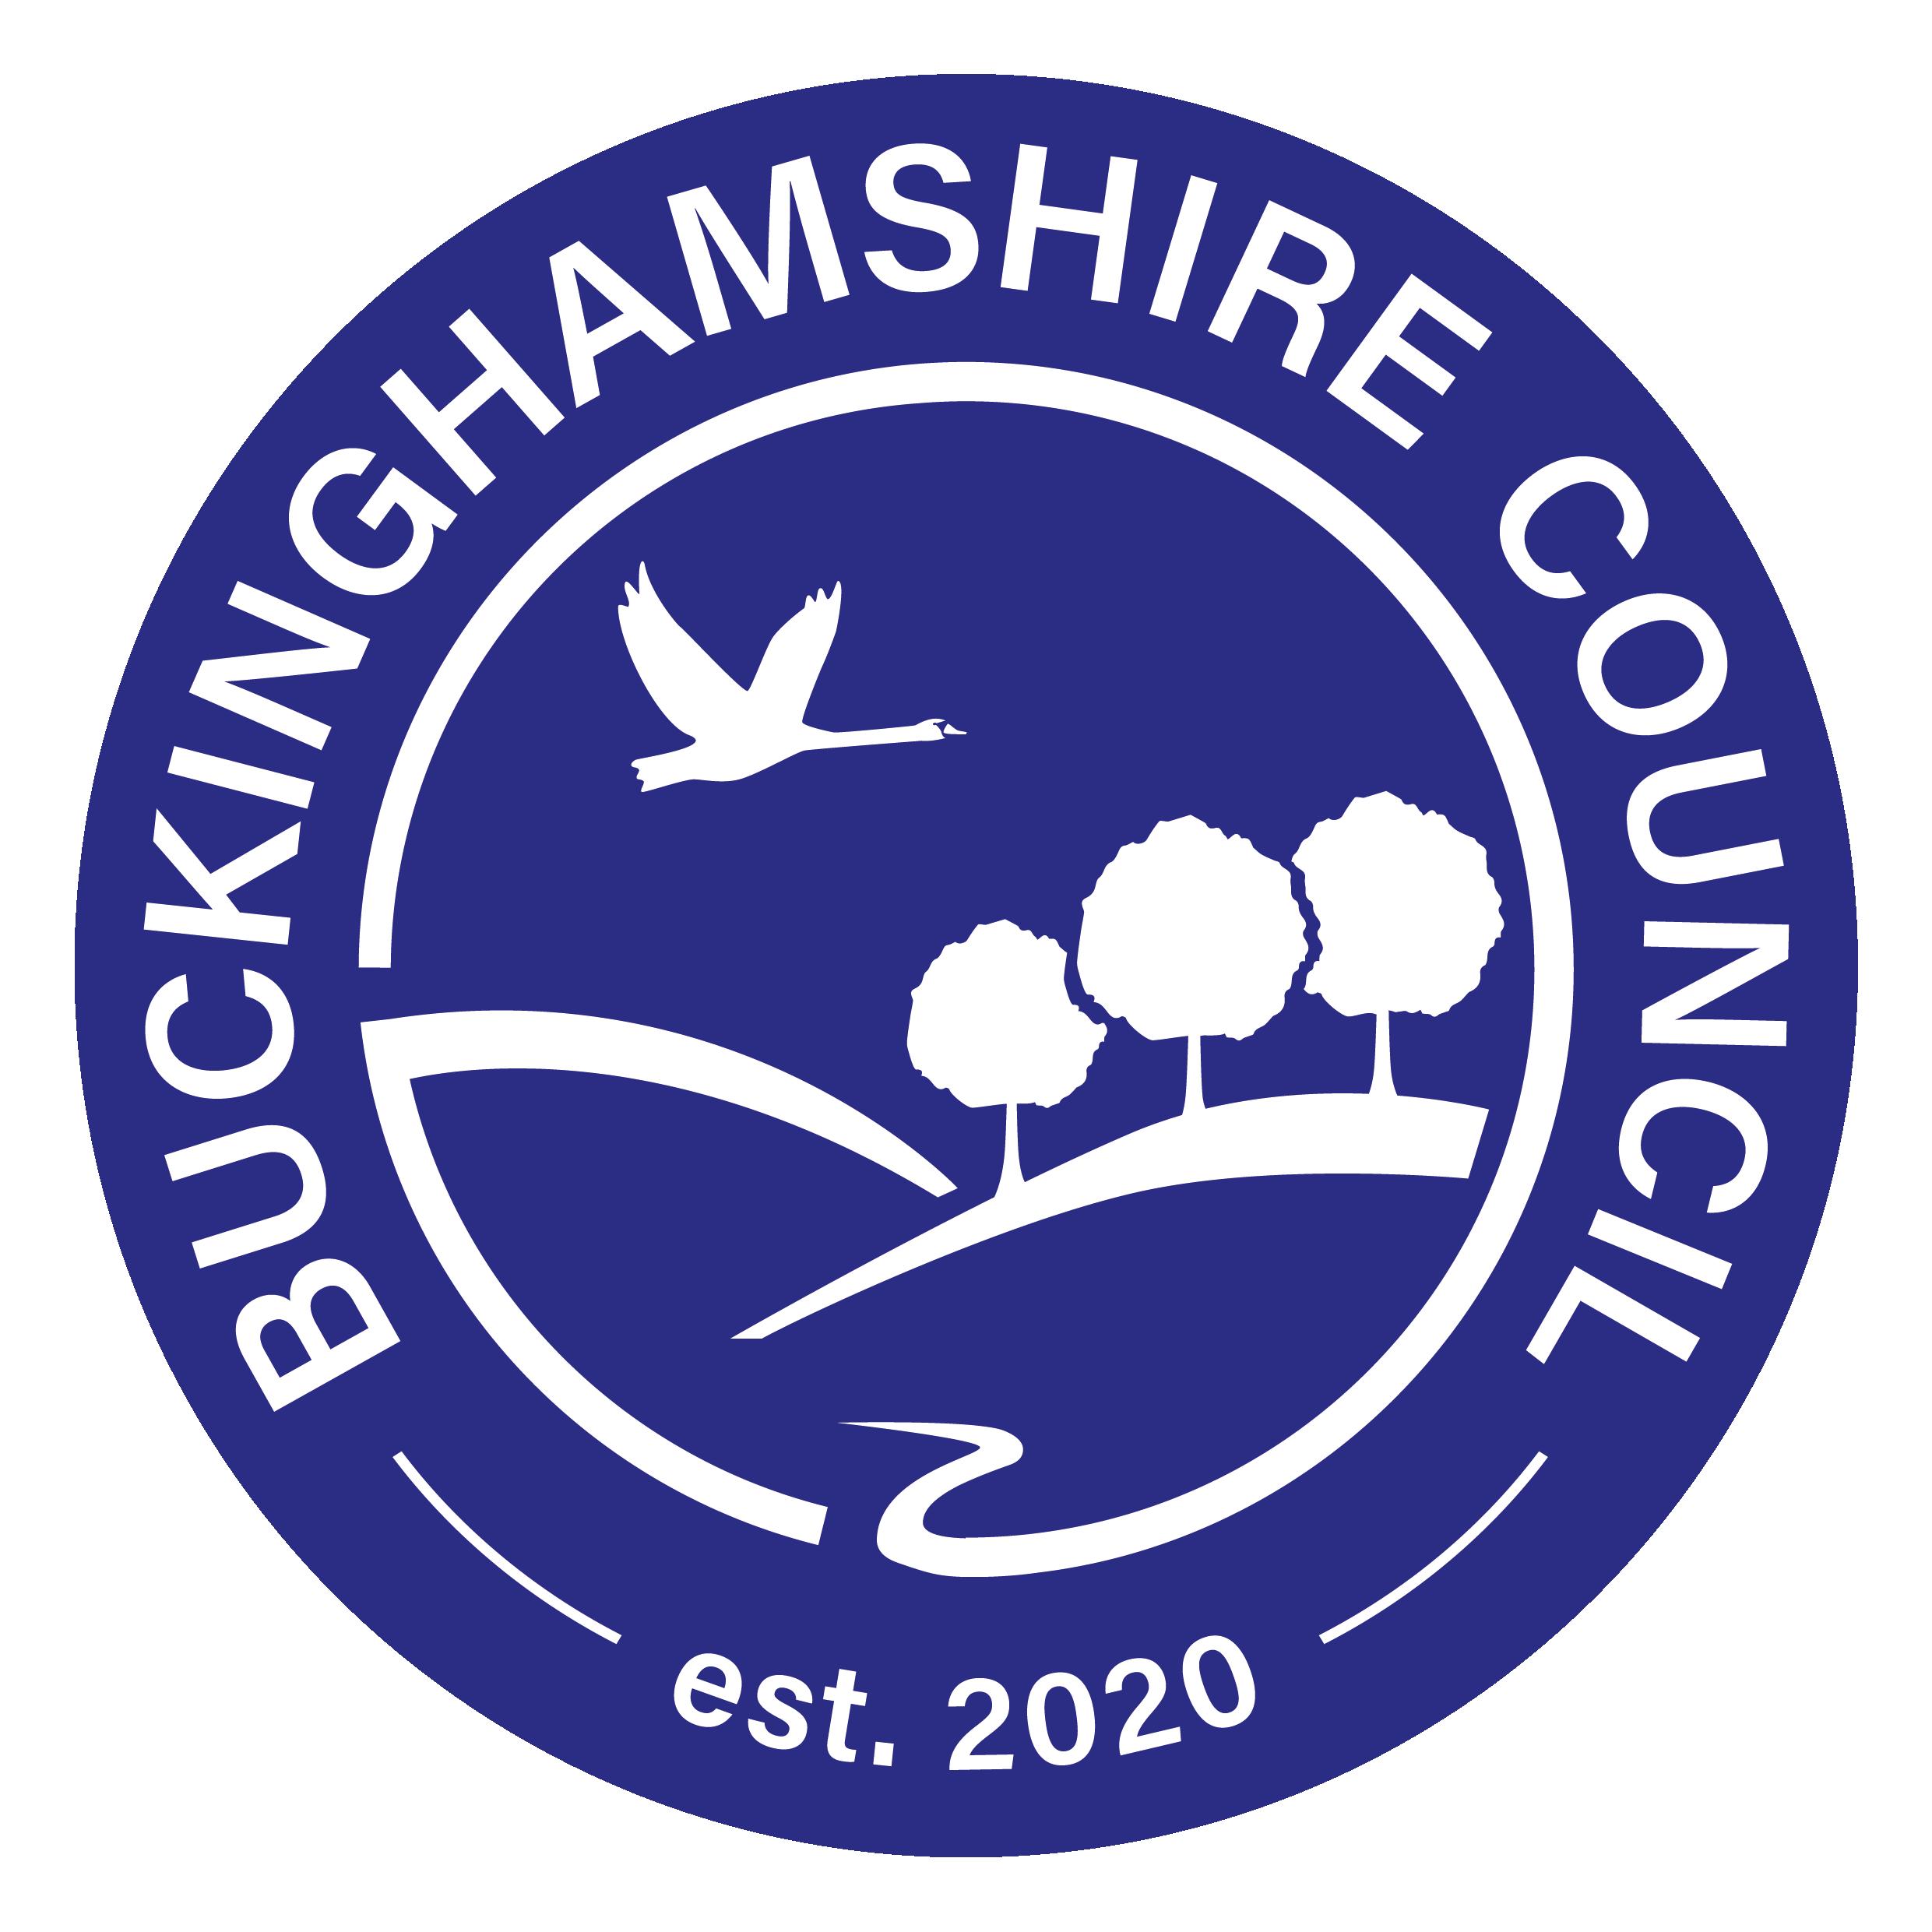 Buckinghamshire Family Information Service's logo